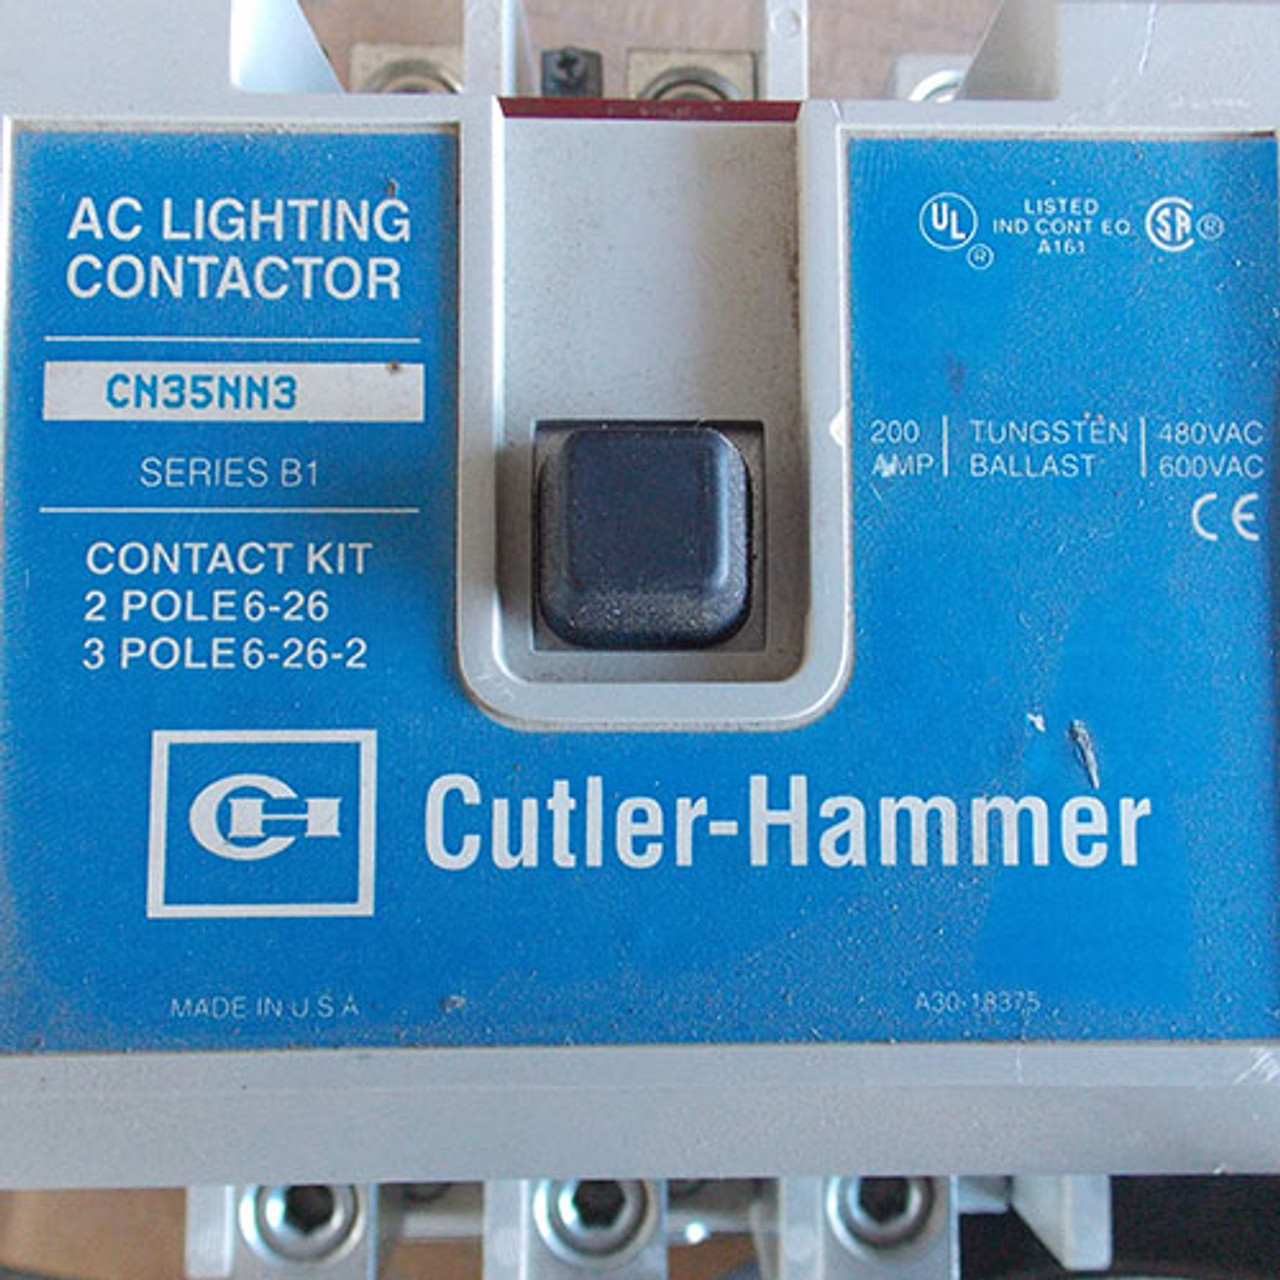 Cutler Hammer CN35NN3 AC Lighting Contactor 200 Amp 3 Pole 480V Coil - Used